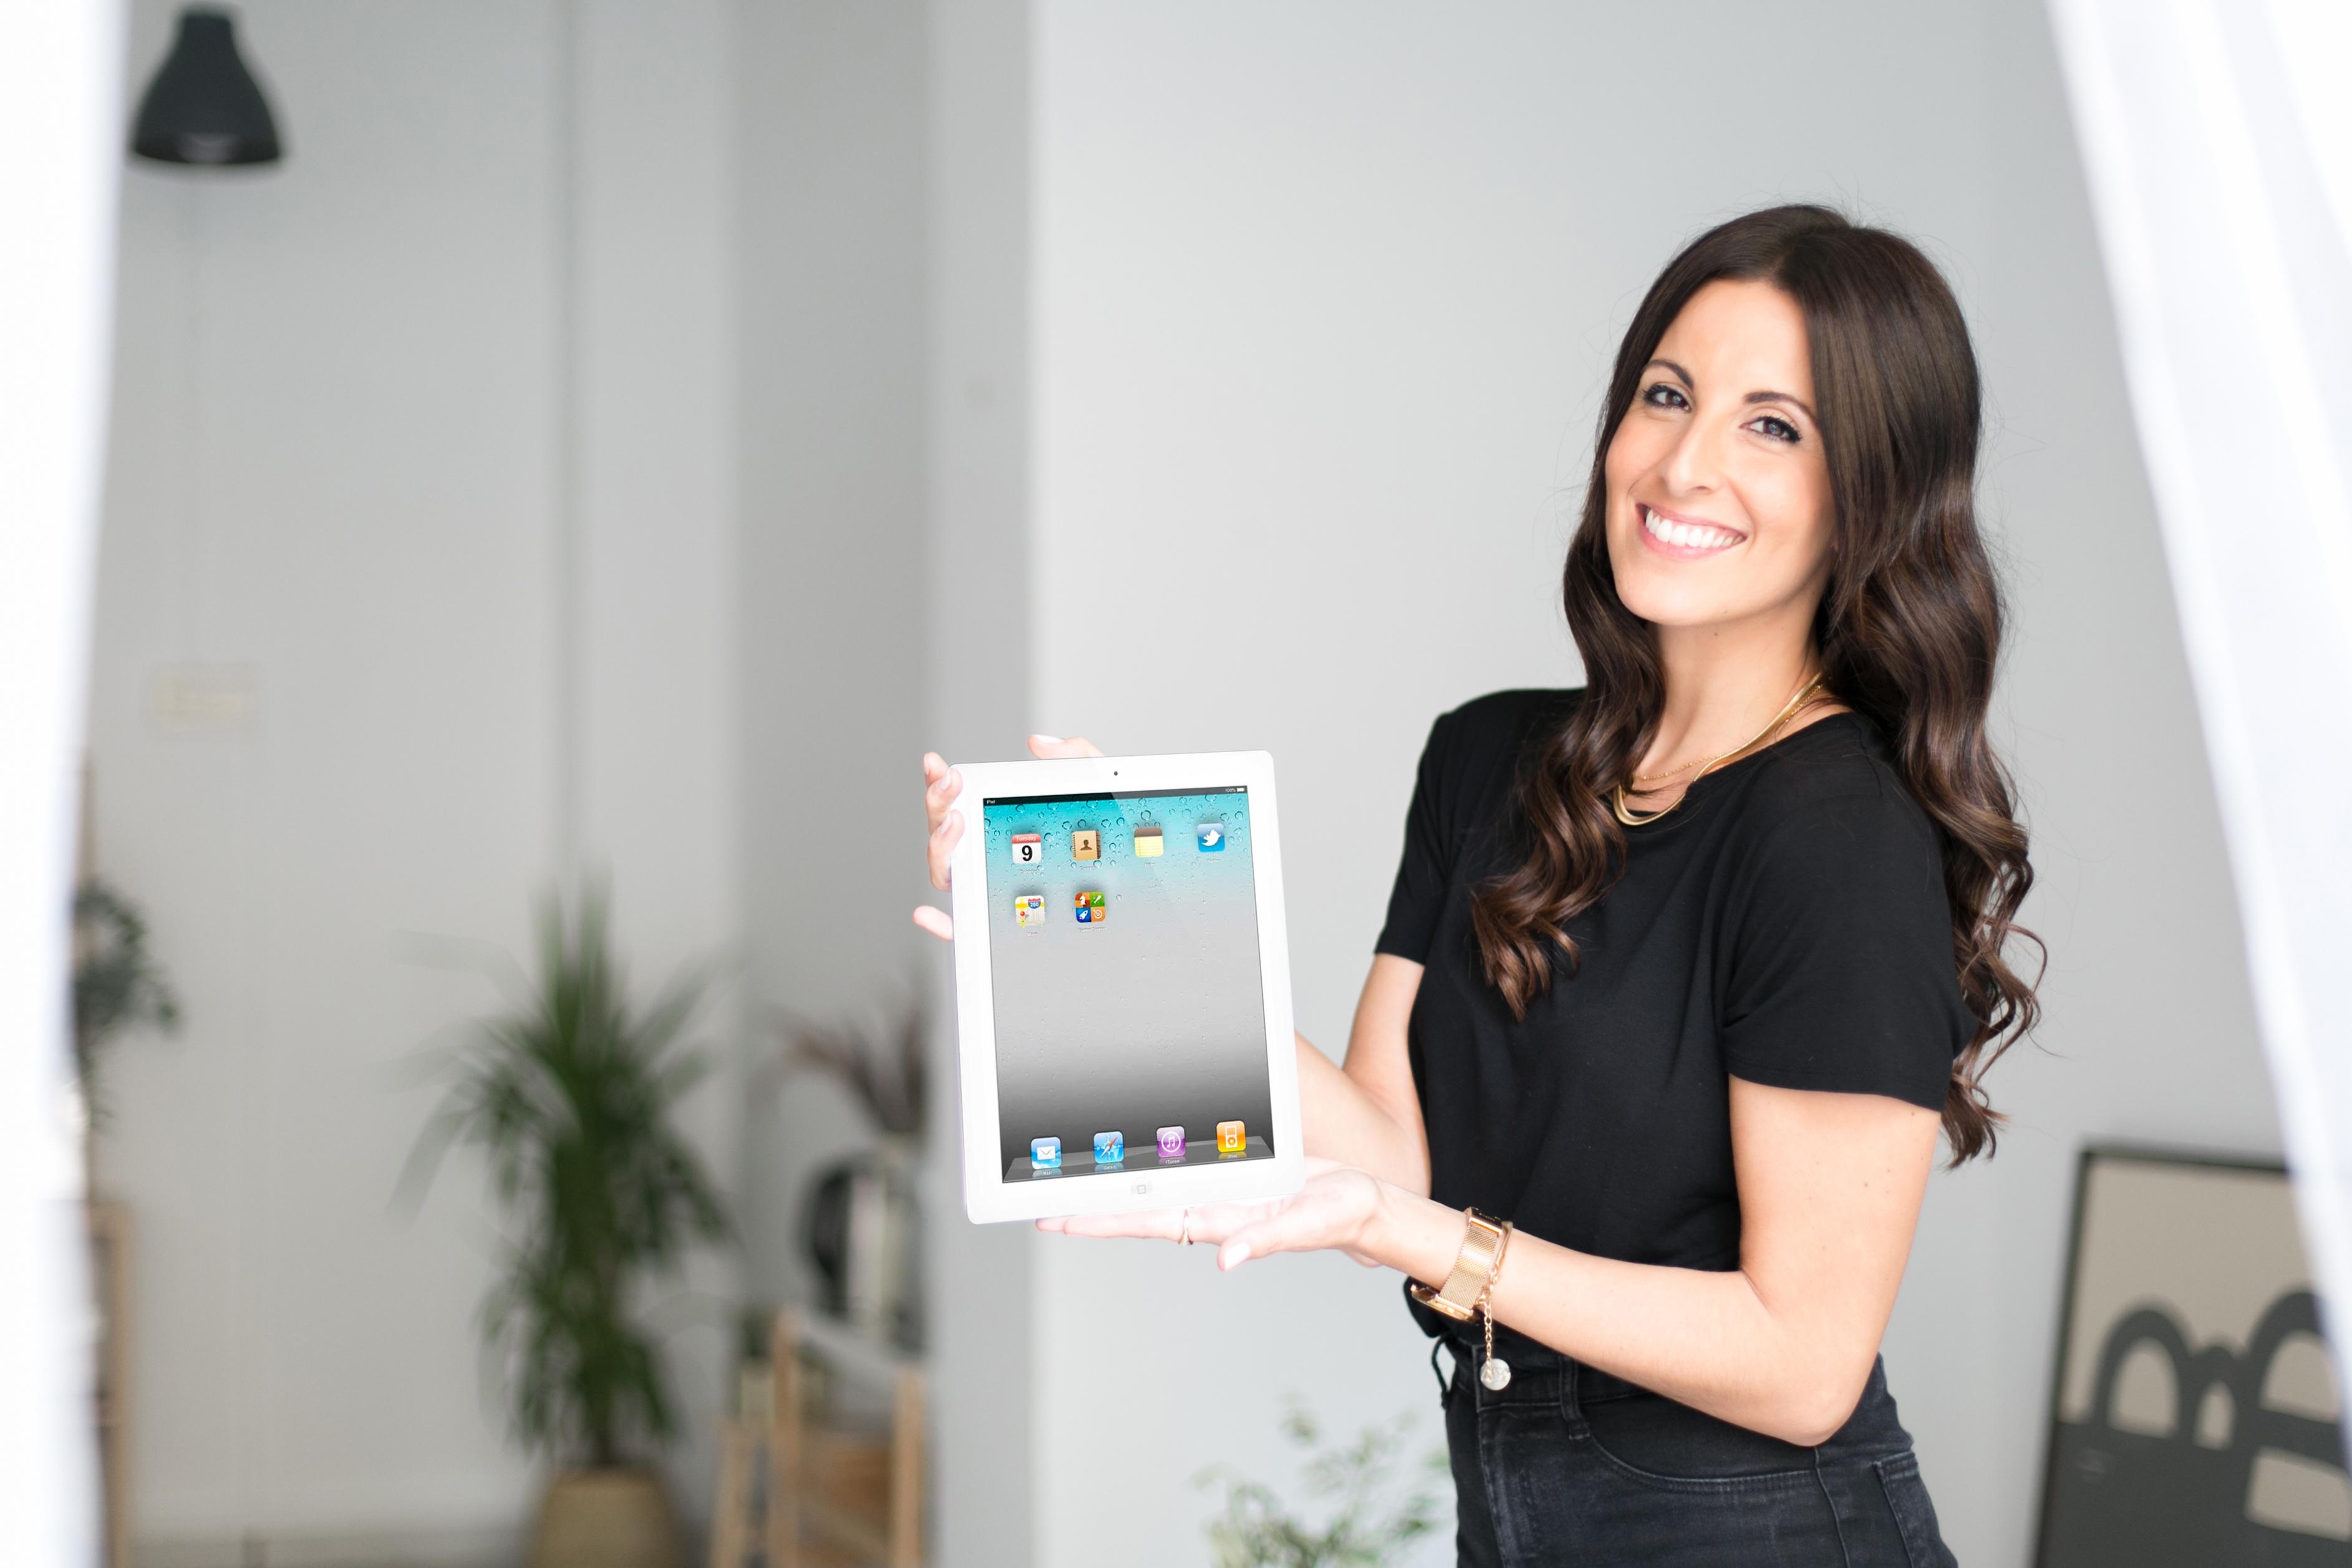 Fotografia corporativa mujer emprendedora